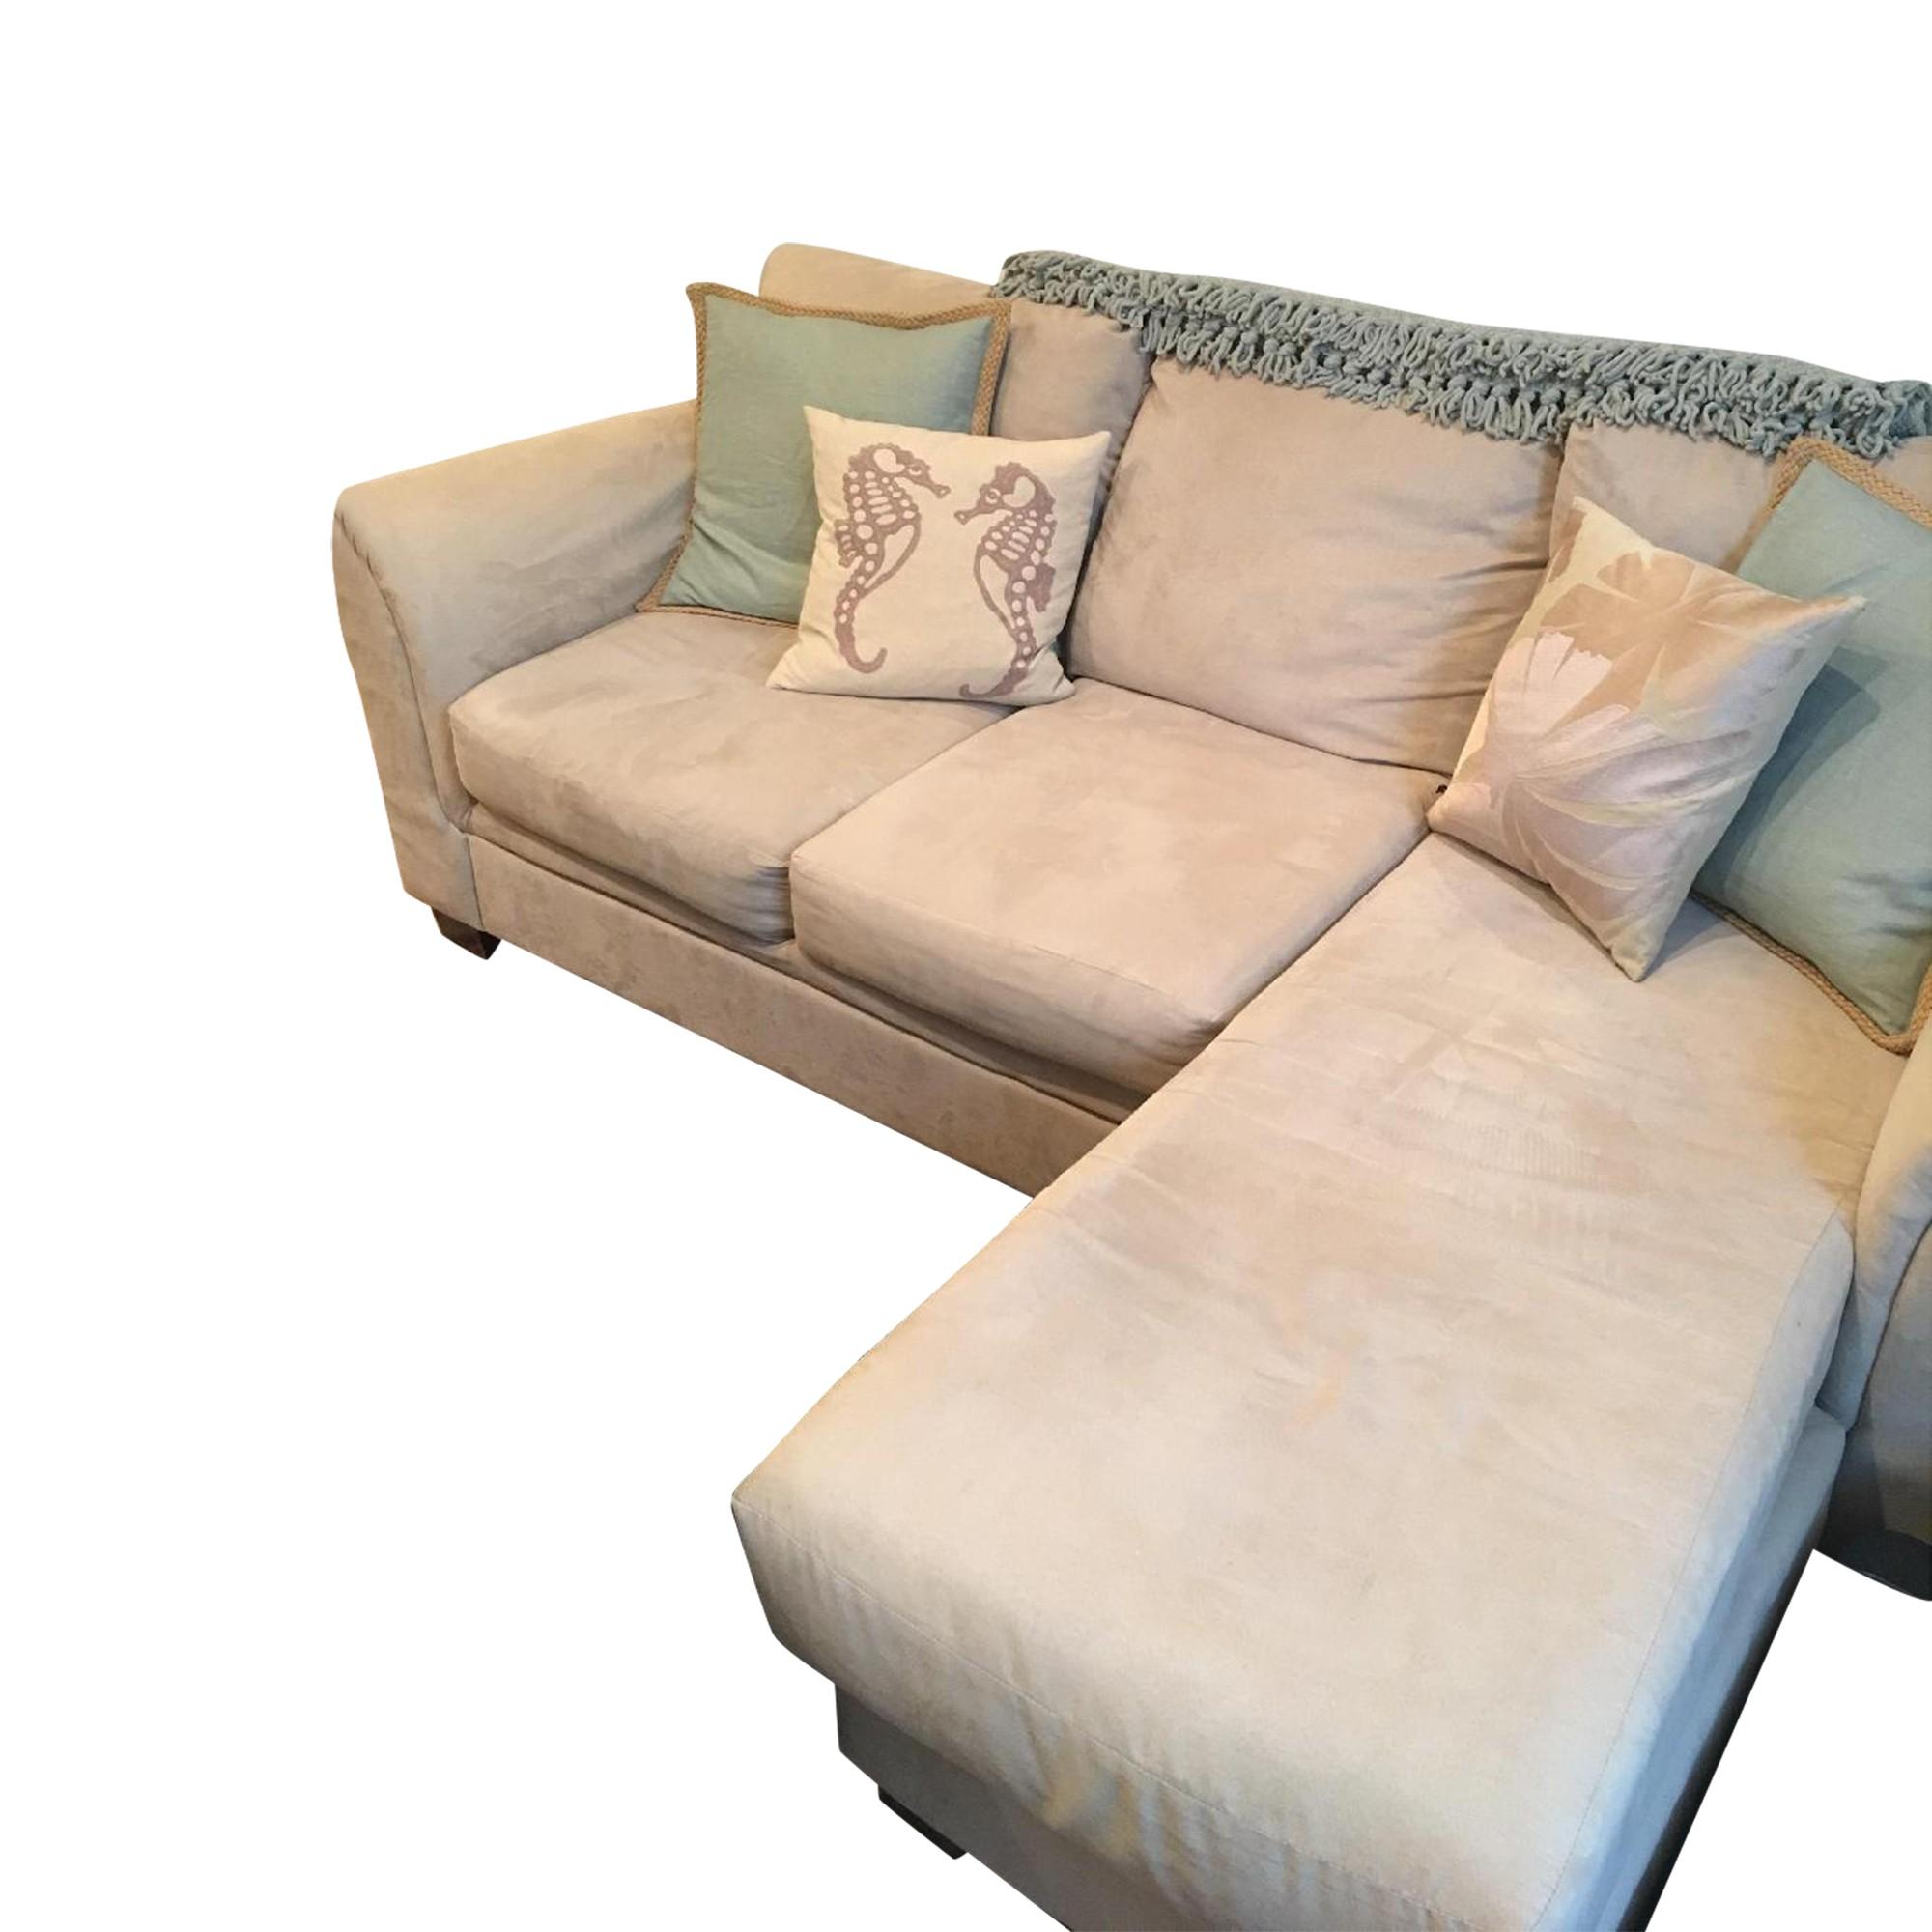 Bob\'s Beige Suede Chaise Sectional Sofa - AptDeco